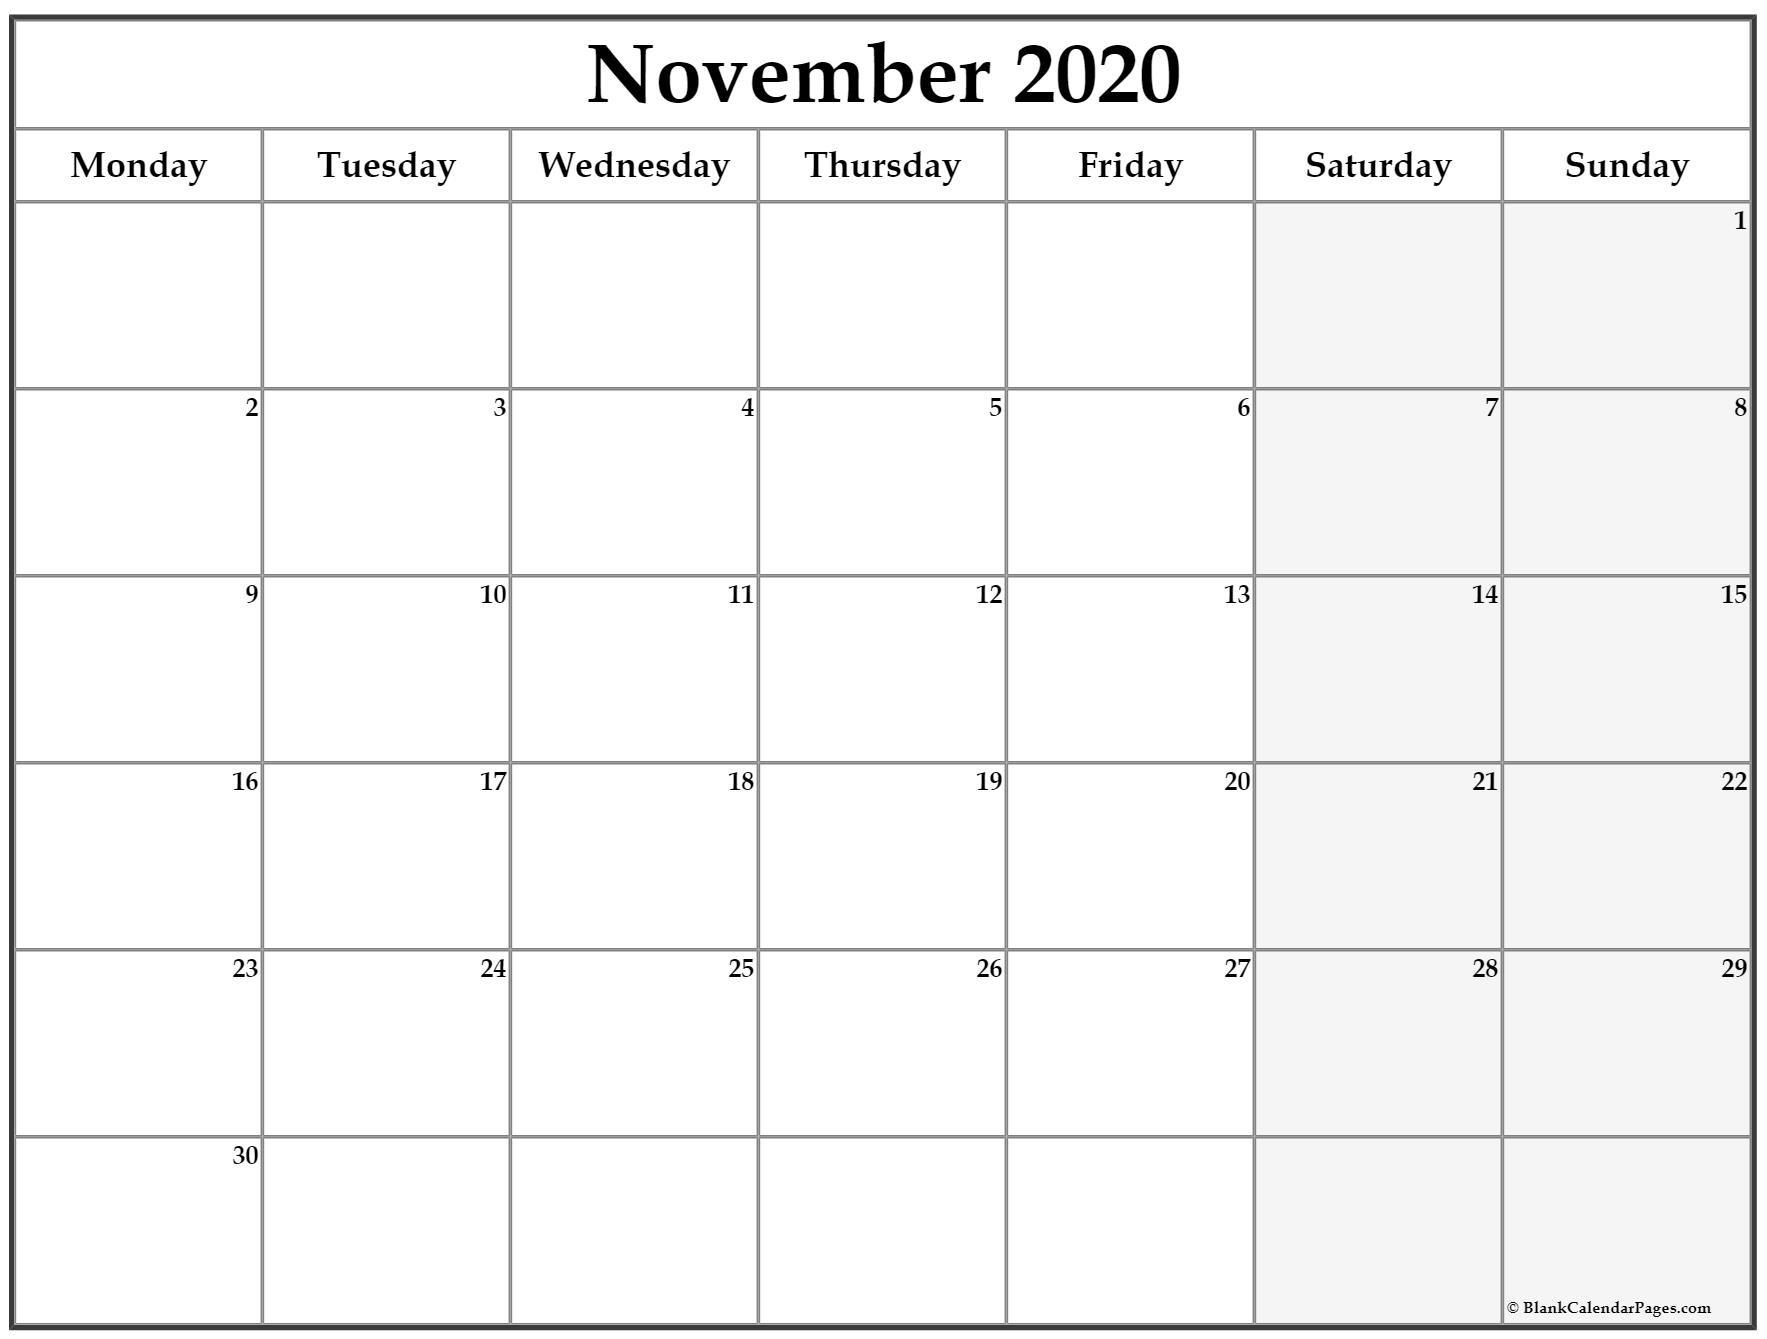 November 2020 Monday Calendar | Monday To Sunday June Calendar Monday Thru Sunday